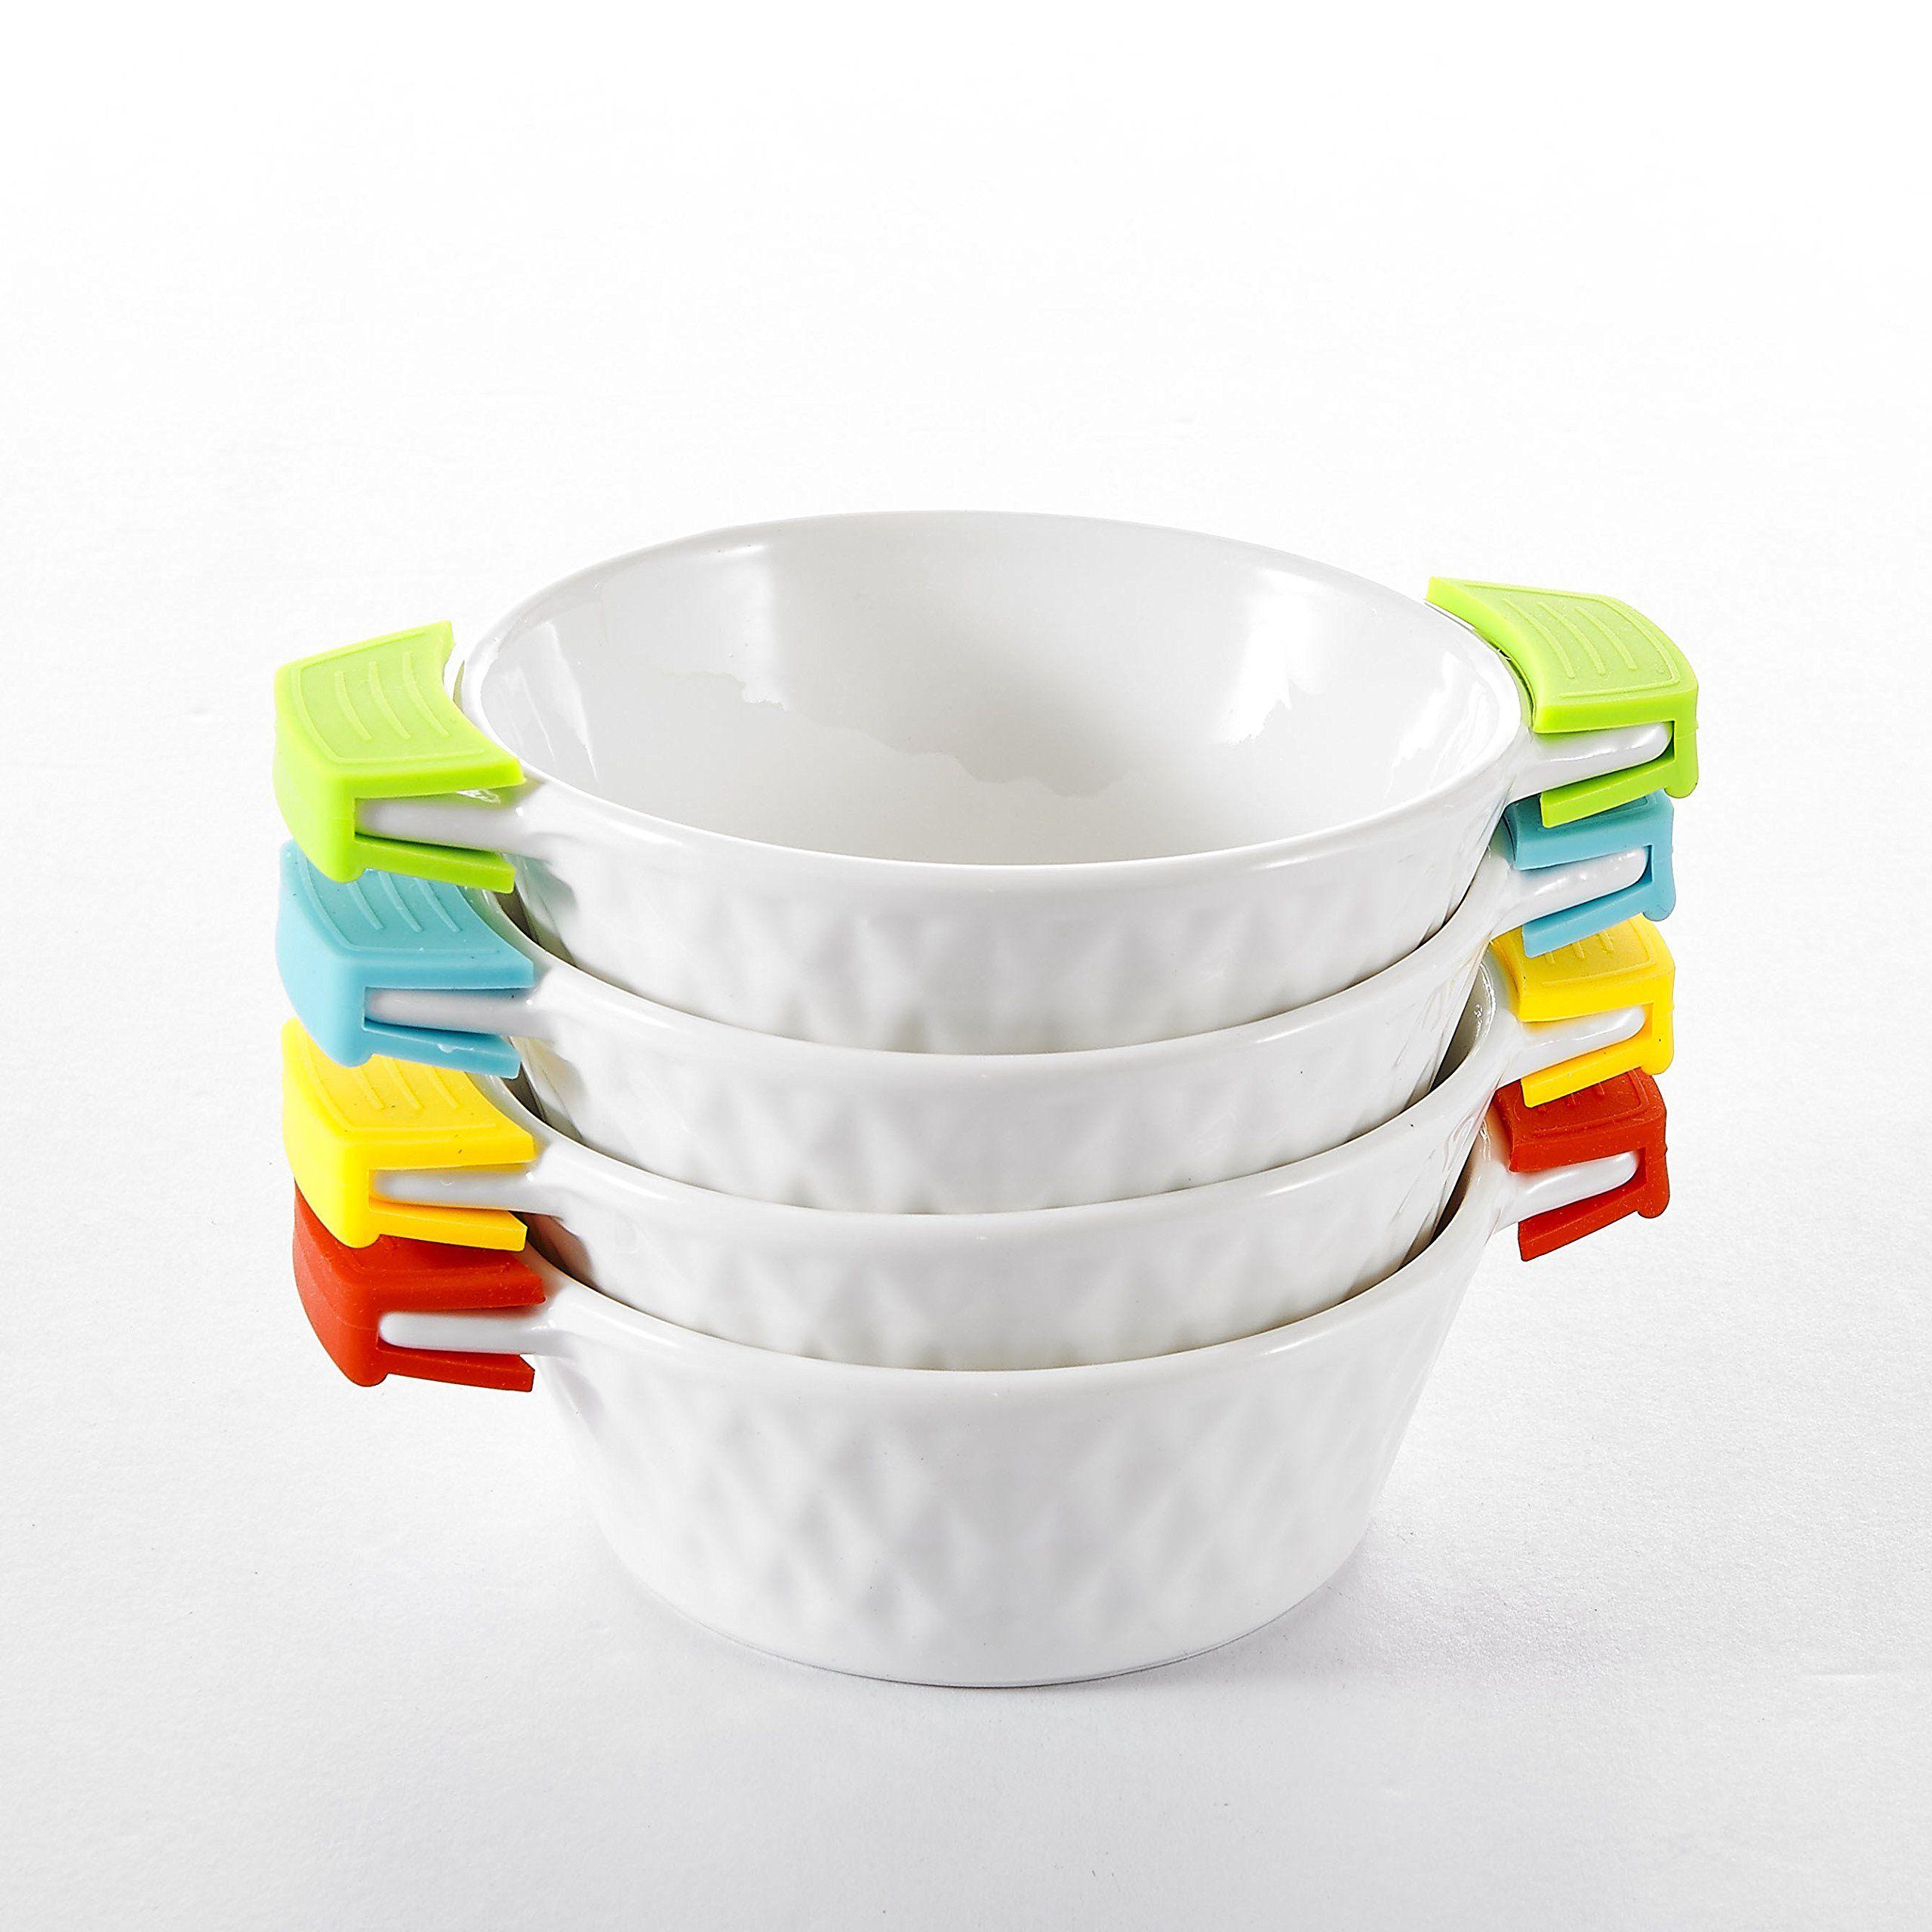 Malacasa 4 Piece Series Bakeware Pans Porcelain China Ceramic